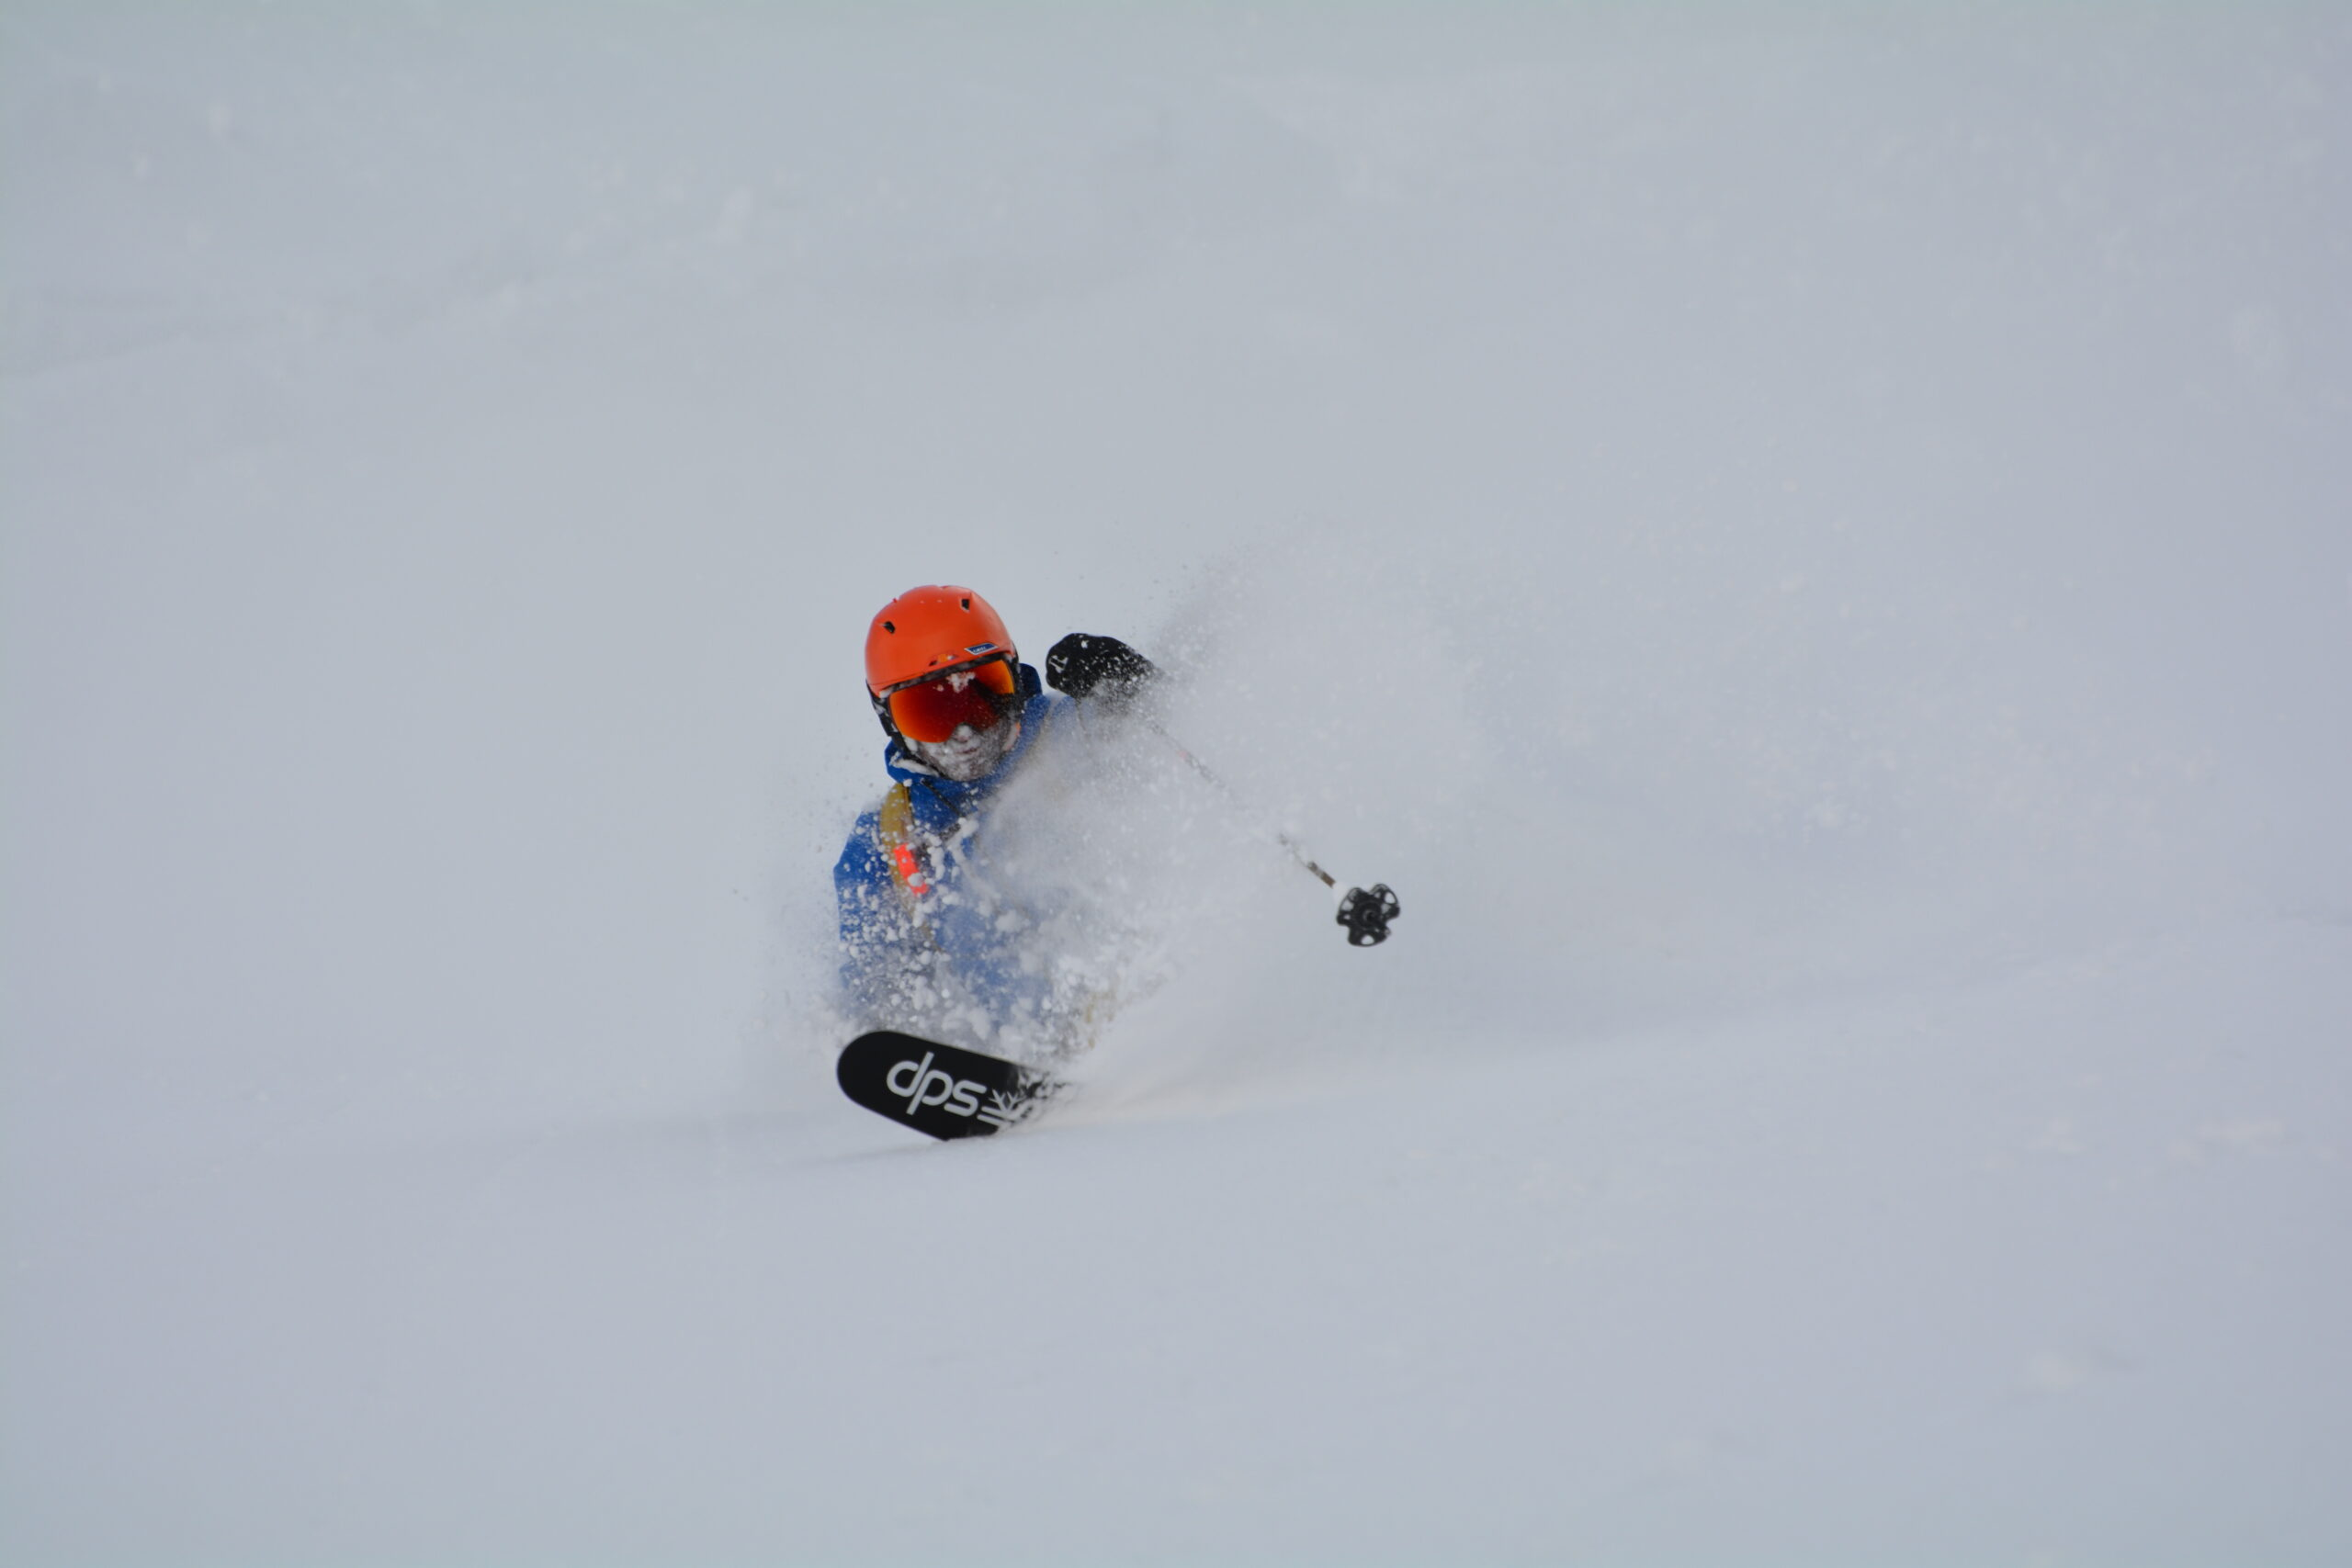 Backcountry Powder Skiing Tenjin Japan